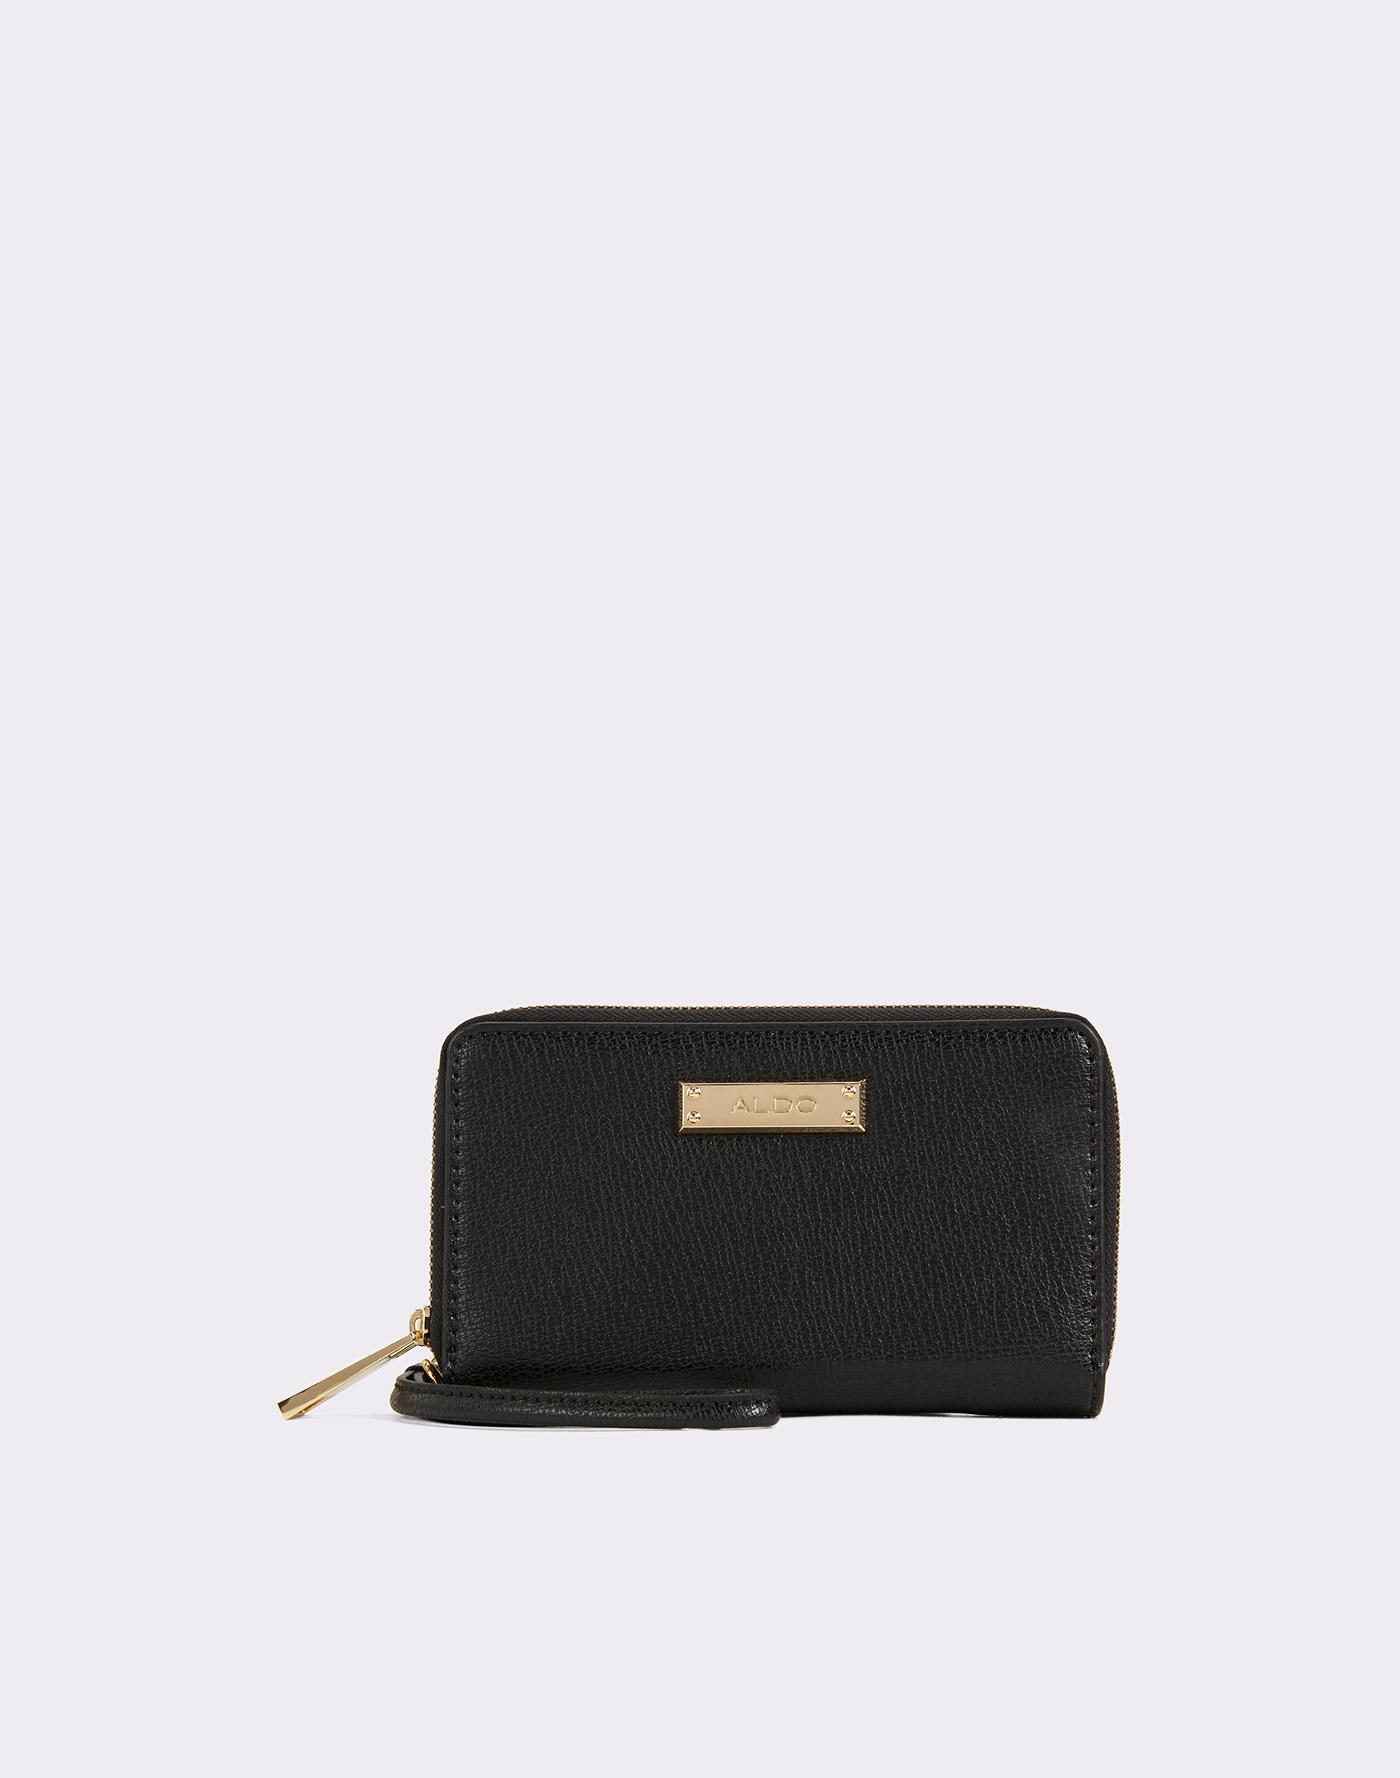 c47fbb02d1 All Handbags